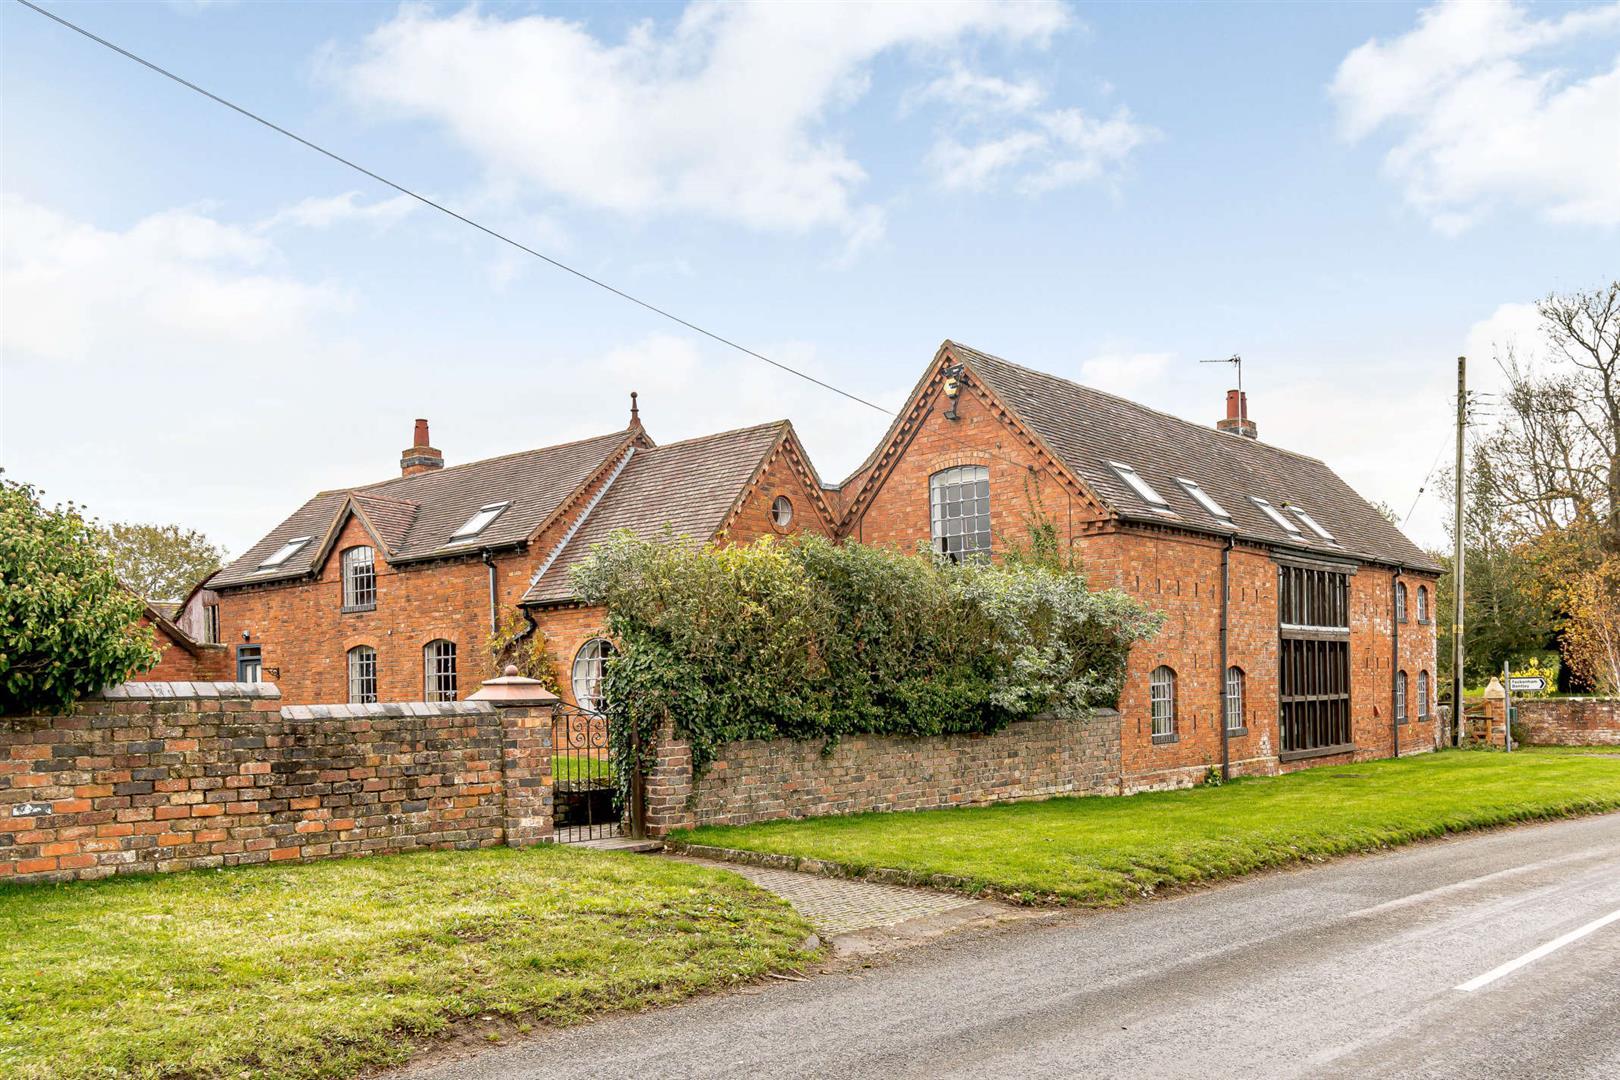 unique red brick English country traditional contemporary barn conversion